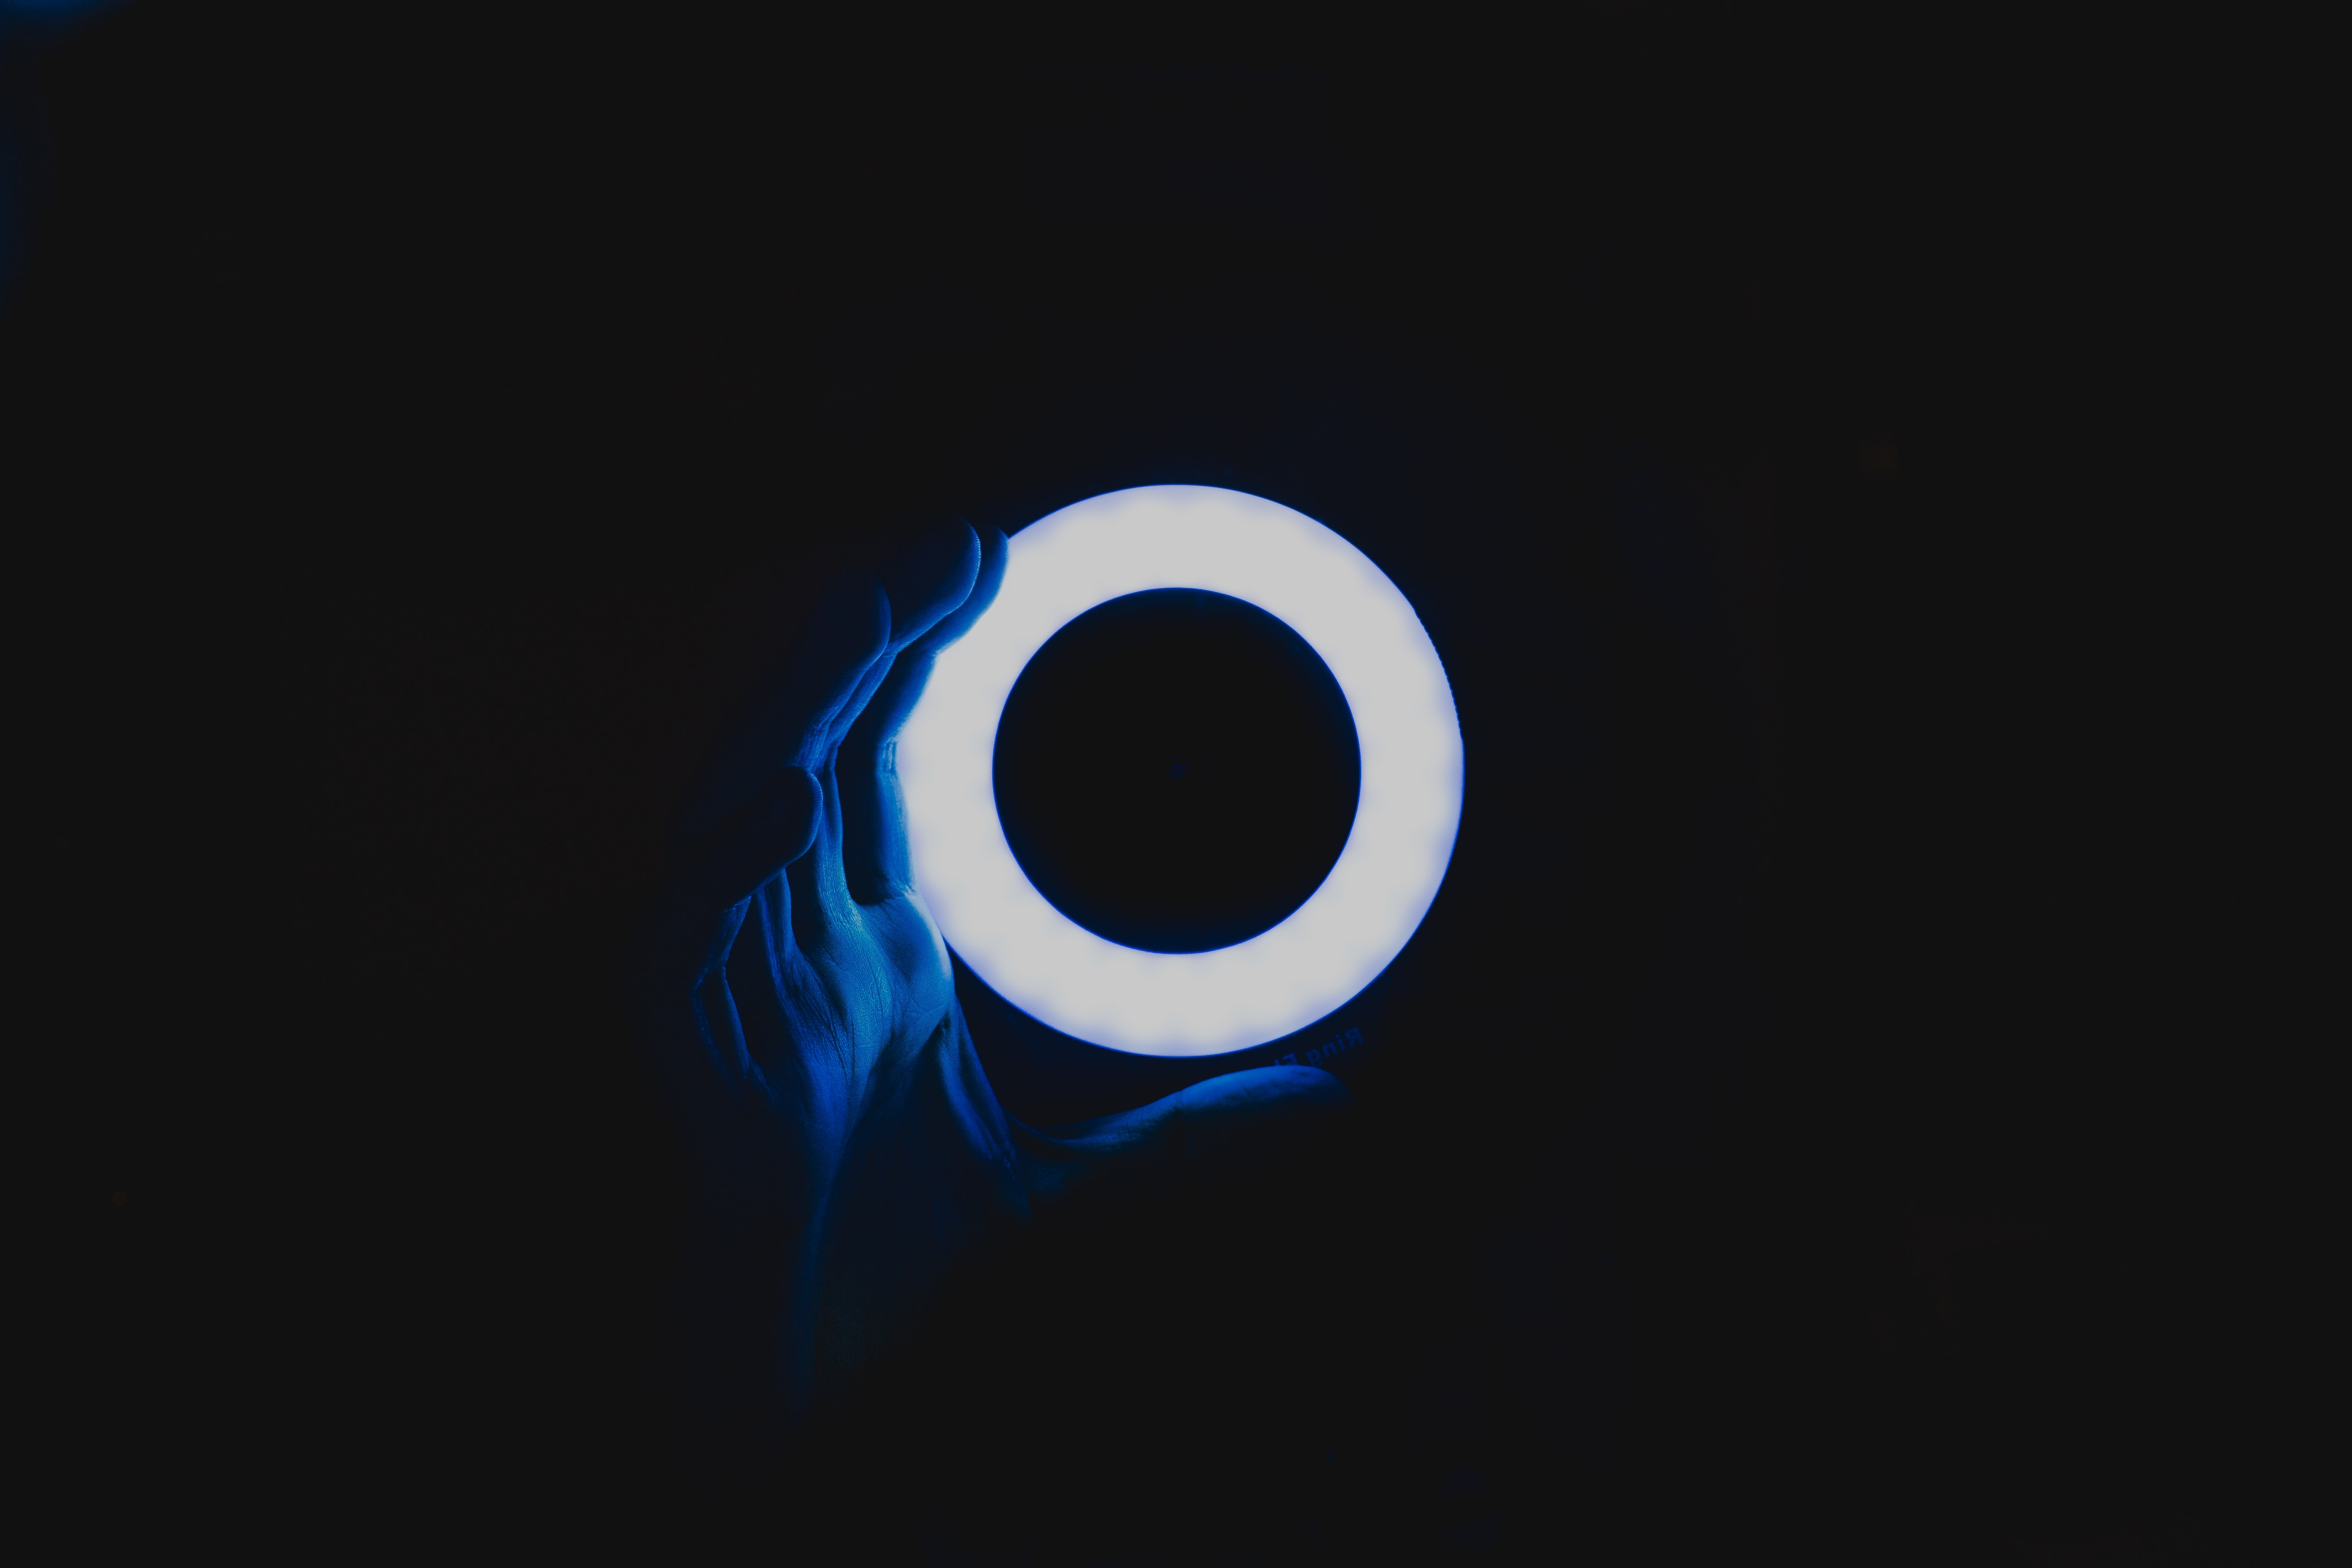 Hand holding a circular lamp